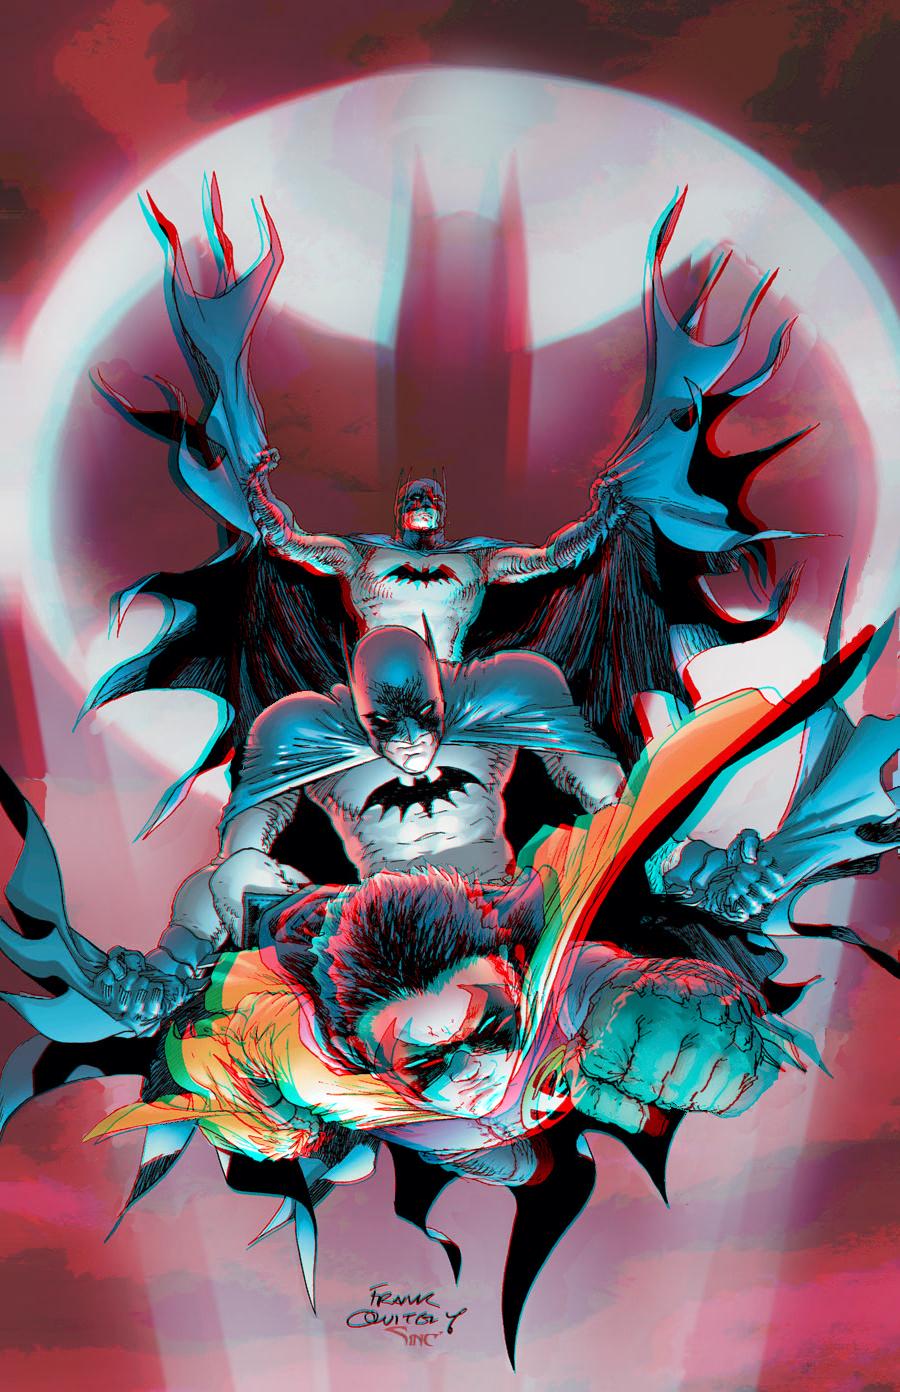 batman_and_robin_3d_anaglyph_by_xmancyclops-d5g5xfq dans 3D